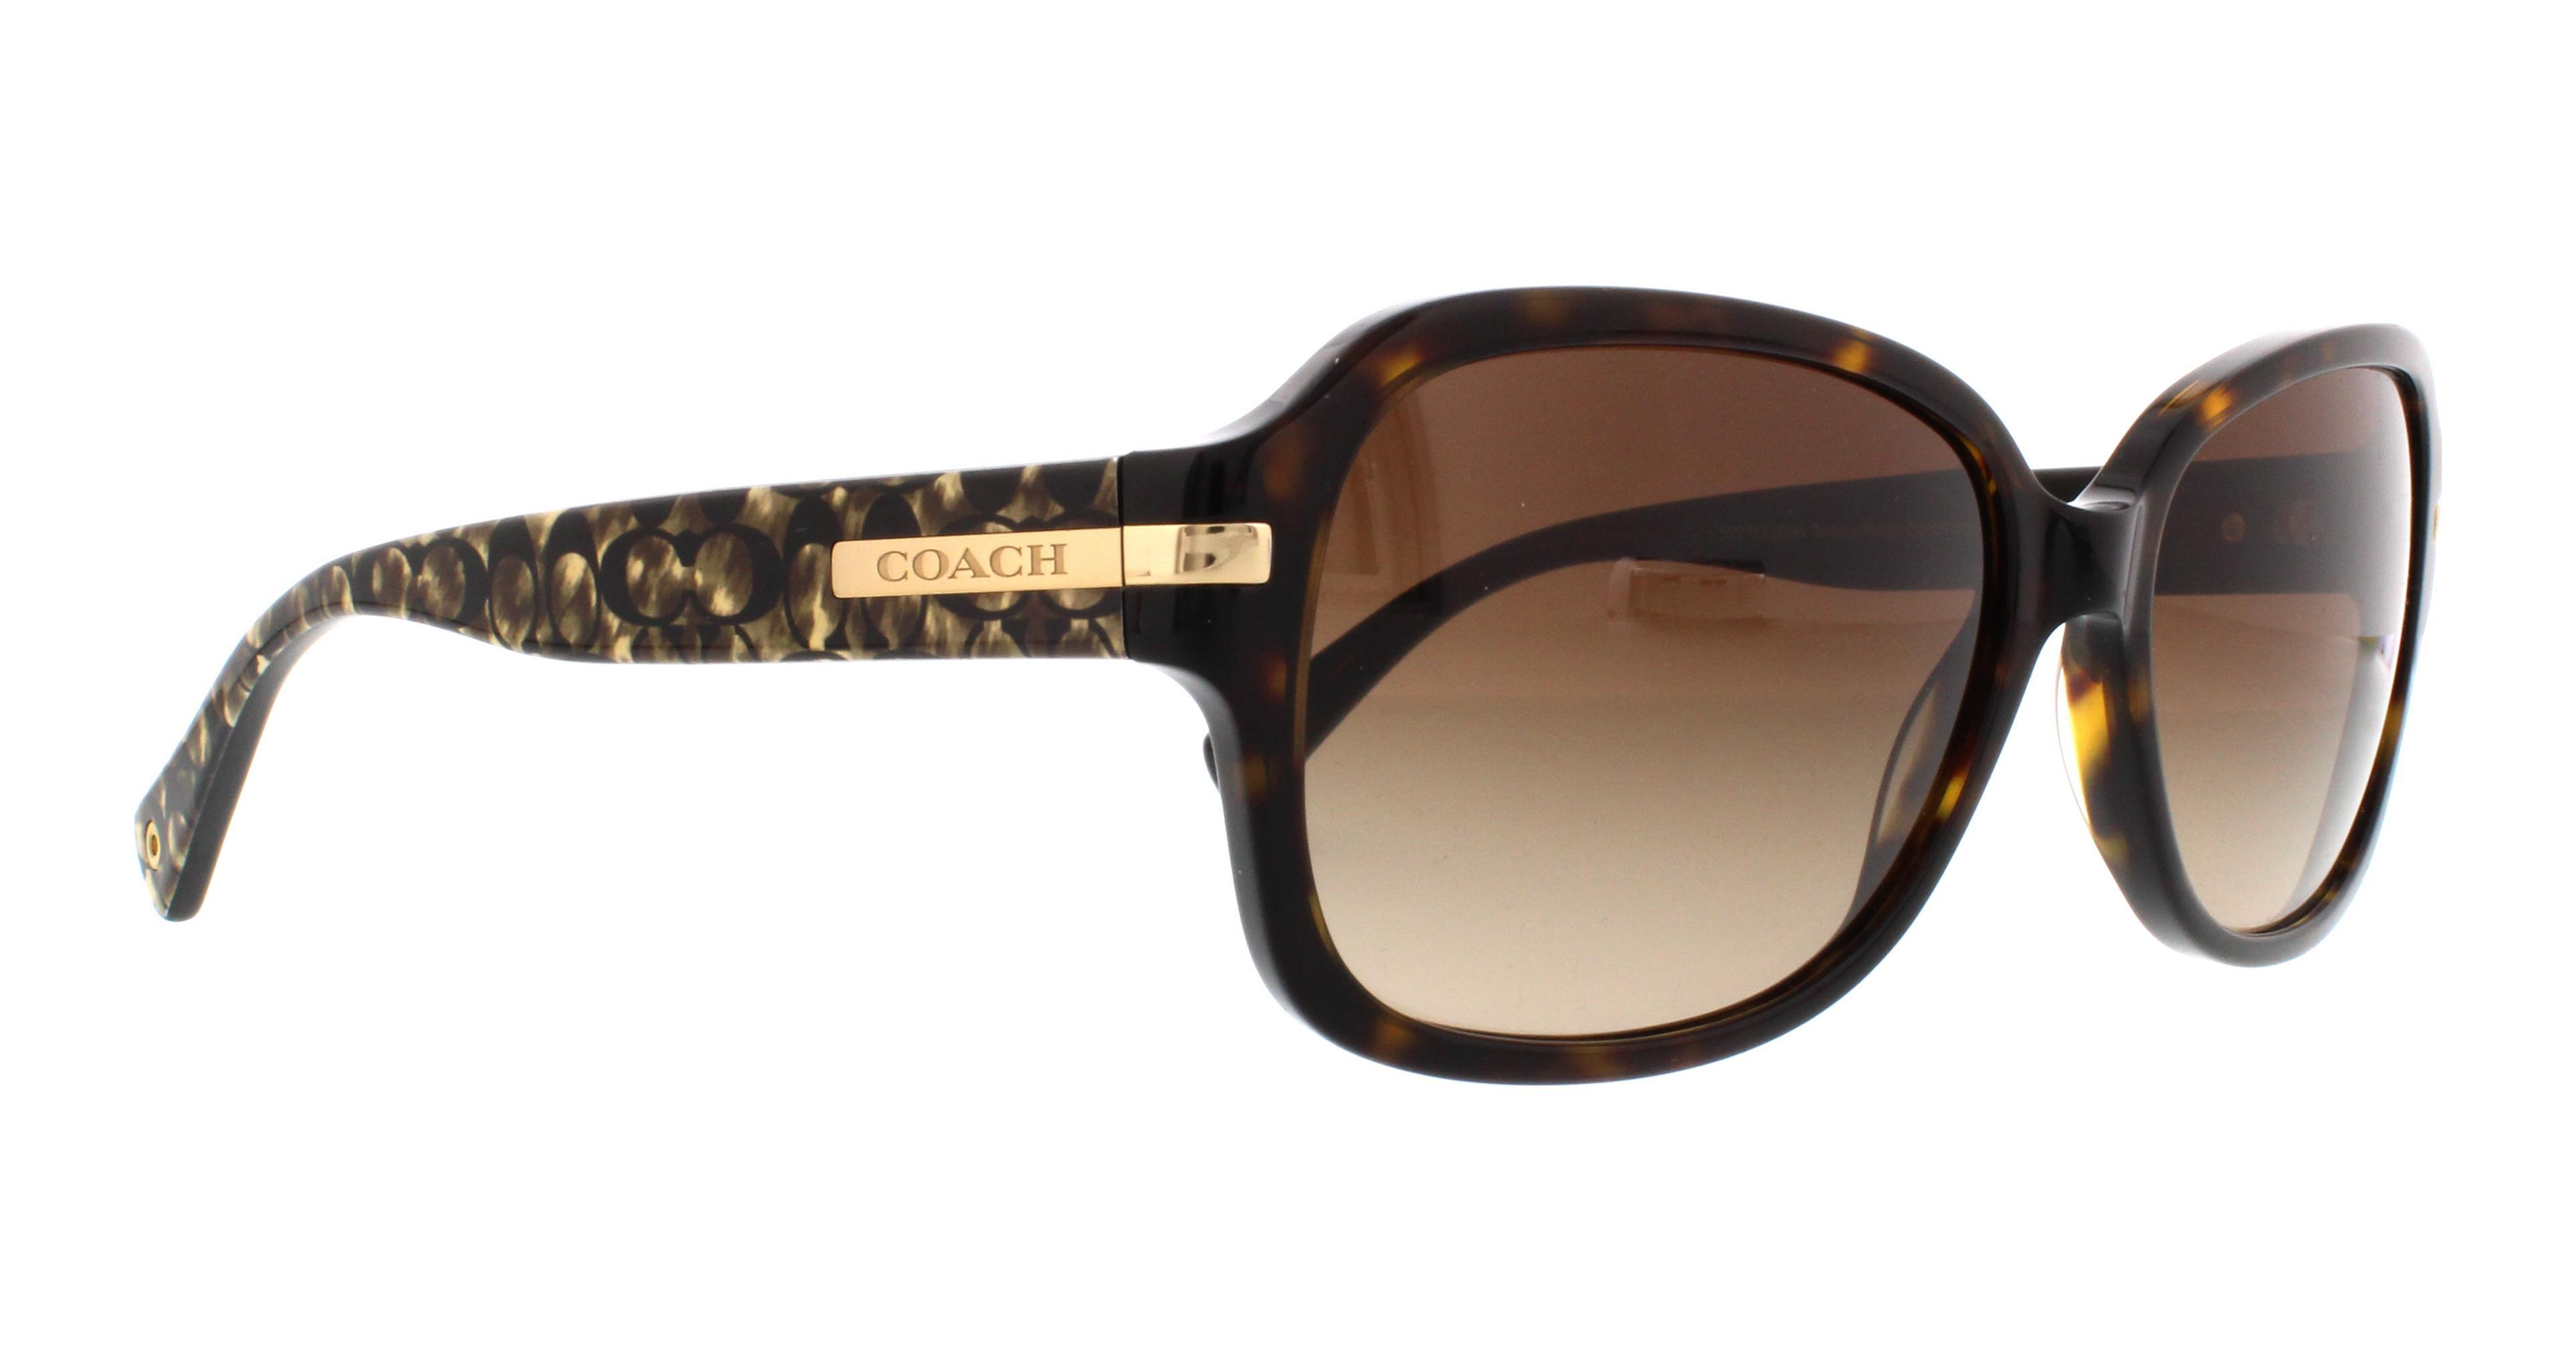 412510a0560 ... france coach sunglasses hc8105 l082 amber 522713 tortoise beige ocelot  58mm 3346d 8199c